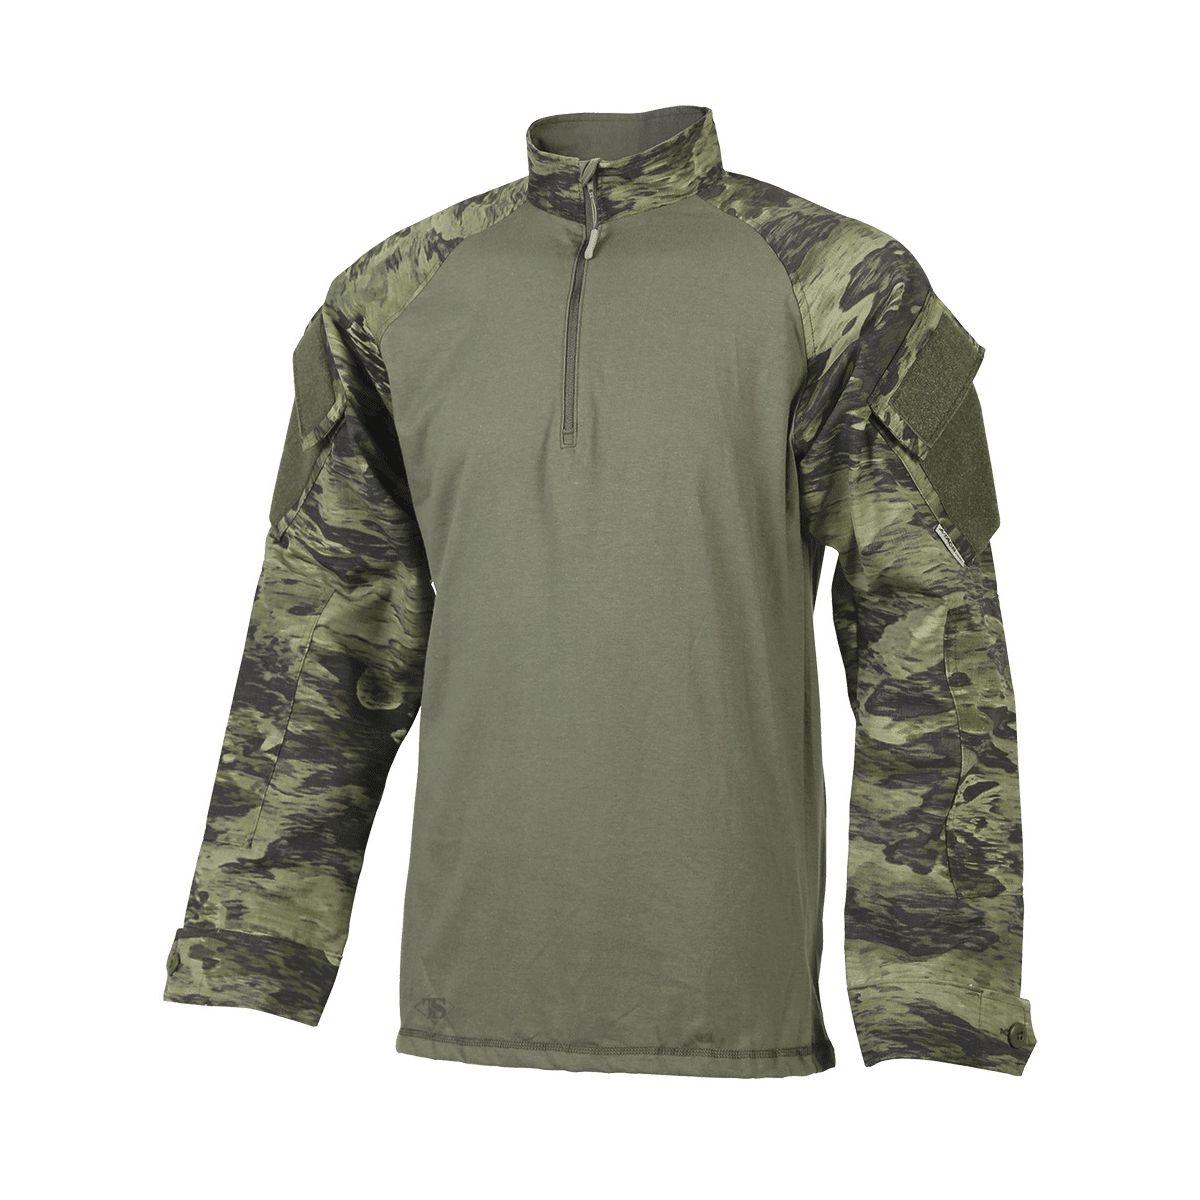 Košile taktická BDU Xtreme 1/4 zip A-TACS FG-X TRU-SPEC 17760 L-11